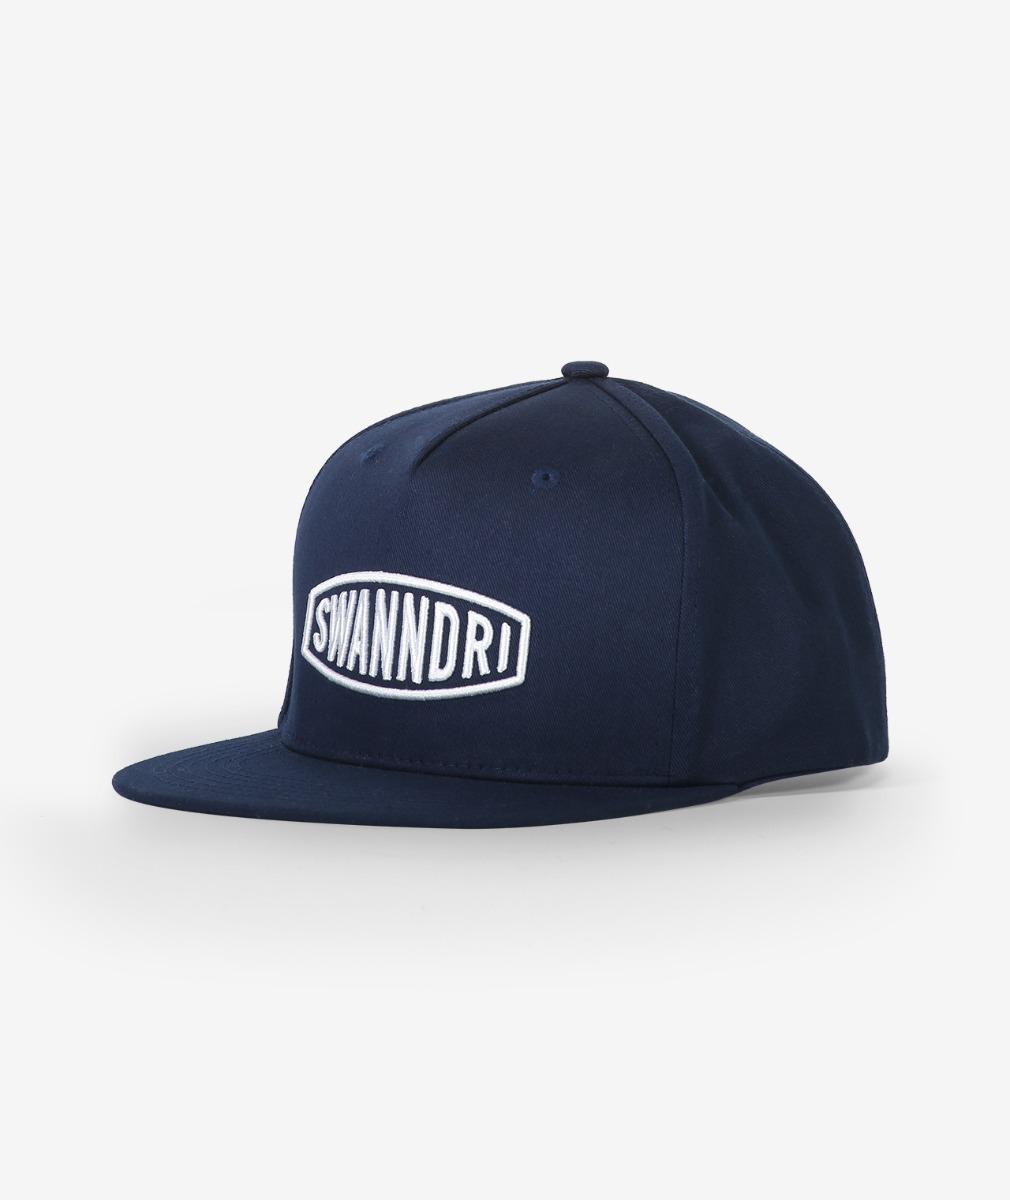 Swanndri Aoraki Wool Blend Cap